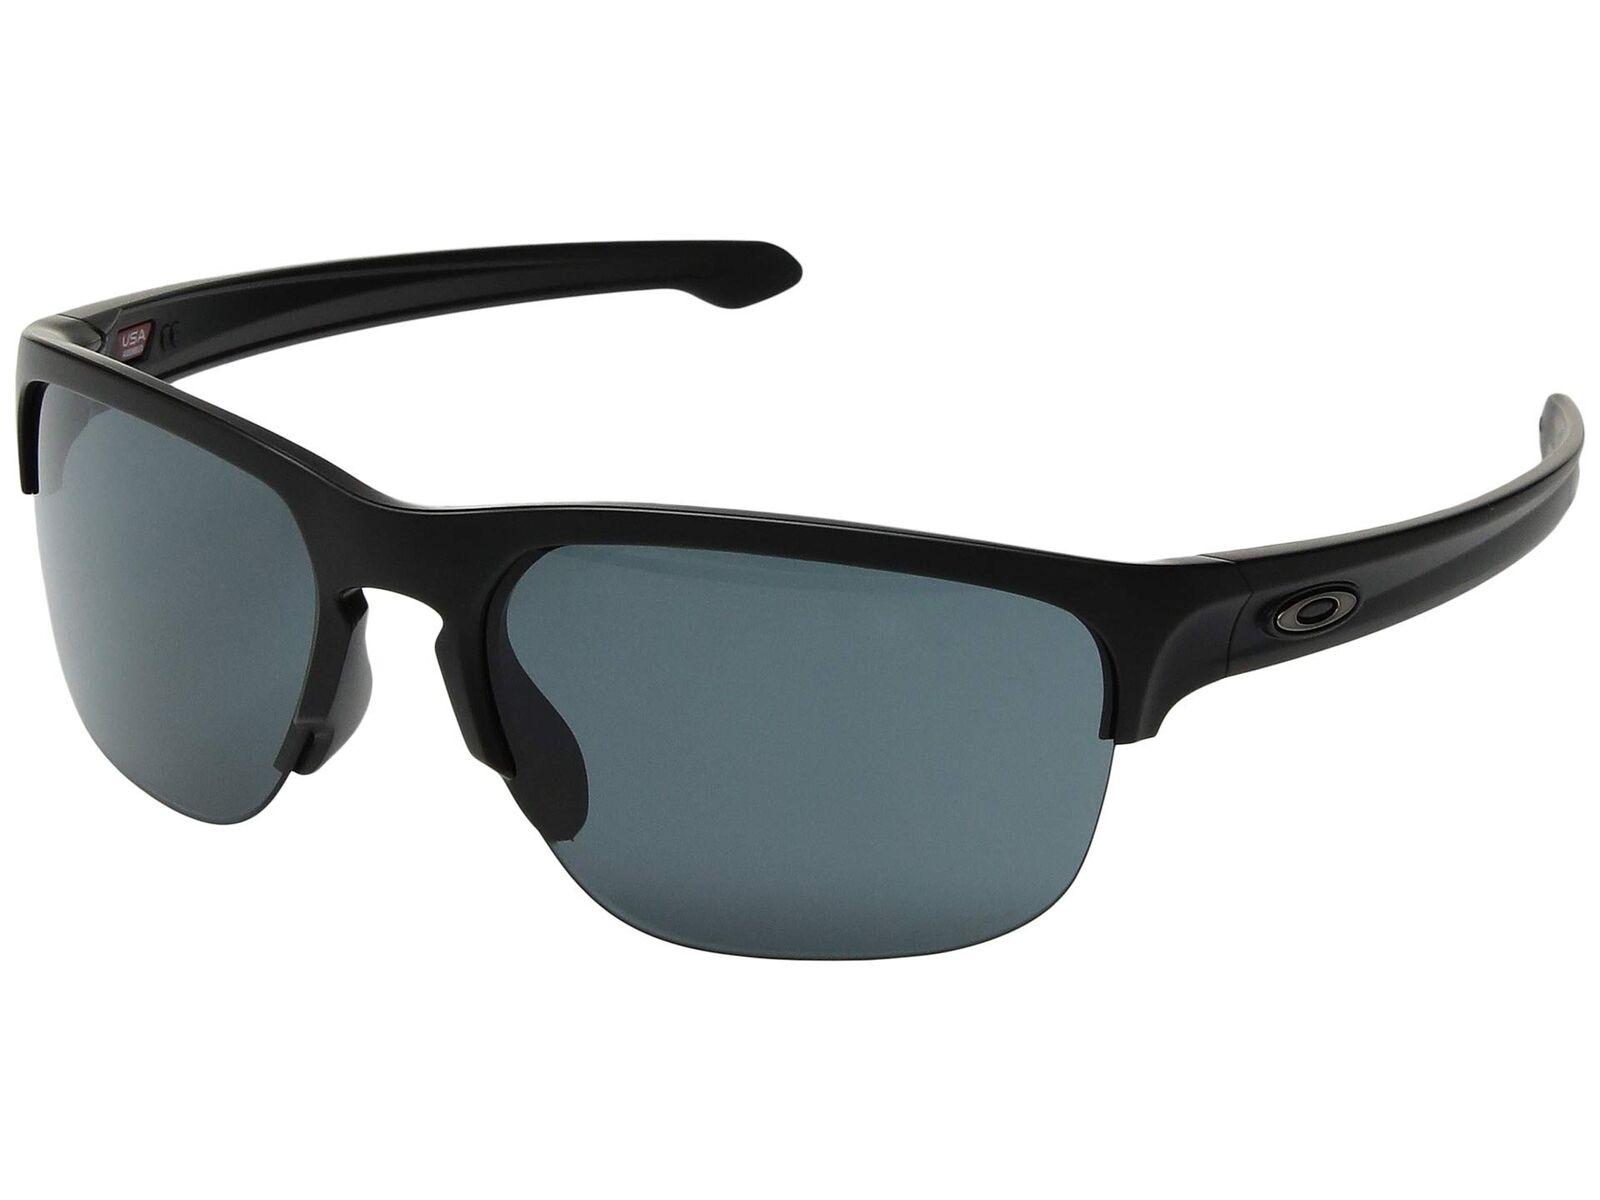 6b44a37a3c7 Oakley Silver Edge OO9413-01 Sunglasses Matte Black Prizm Grey Lens 9413 01